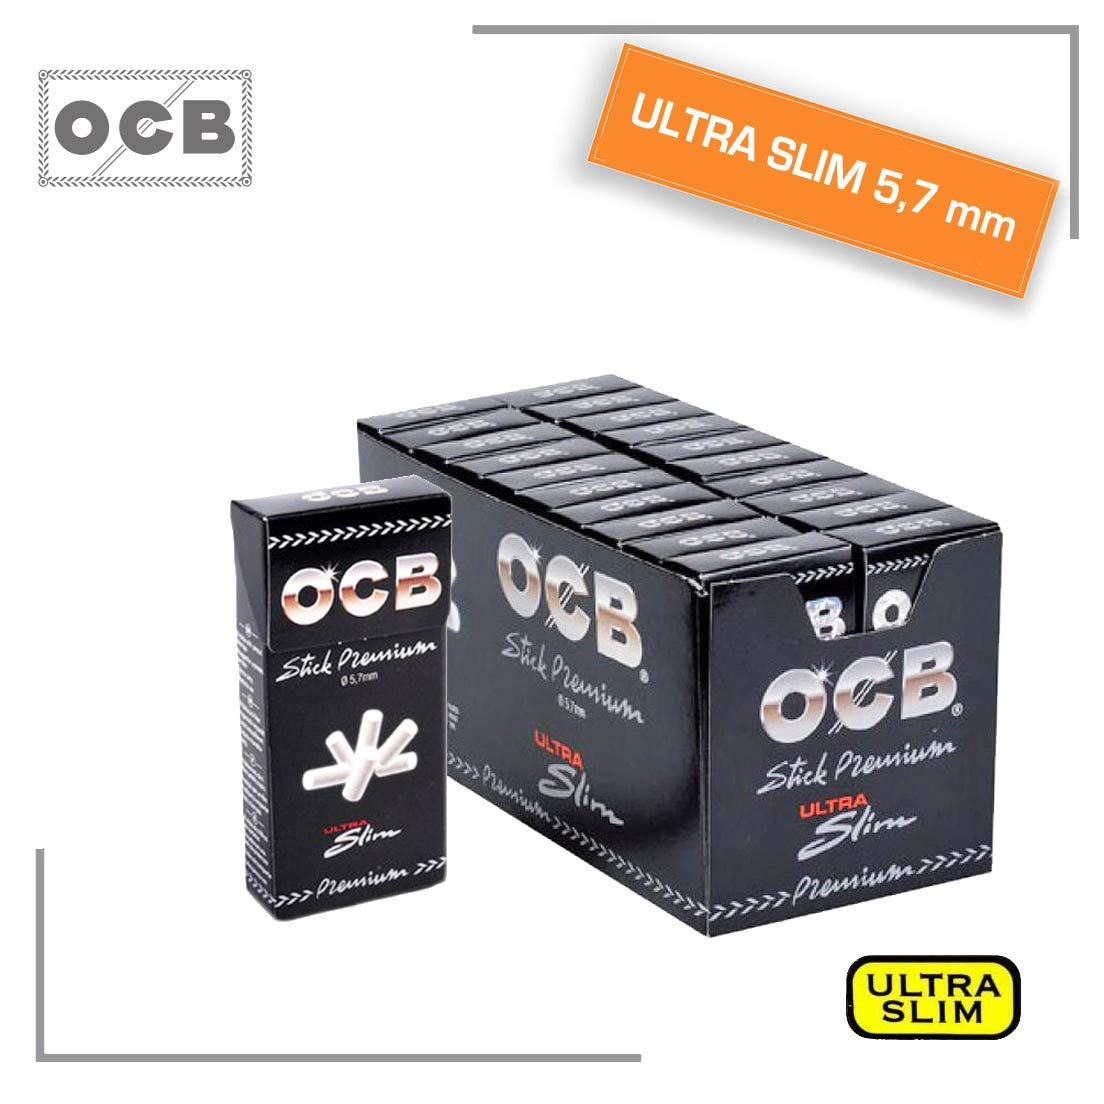 Box 20 Scatoline da 120 Filtri Ocb Ultraslim 5,7mm